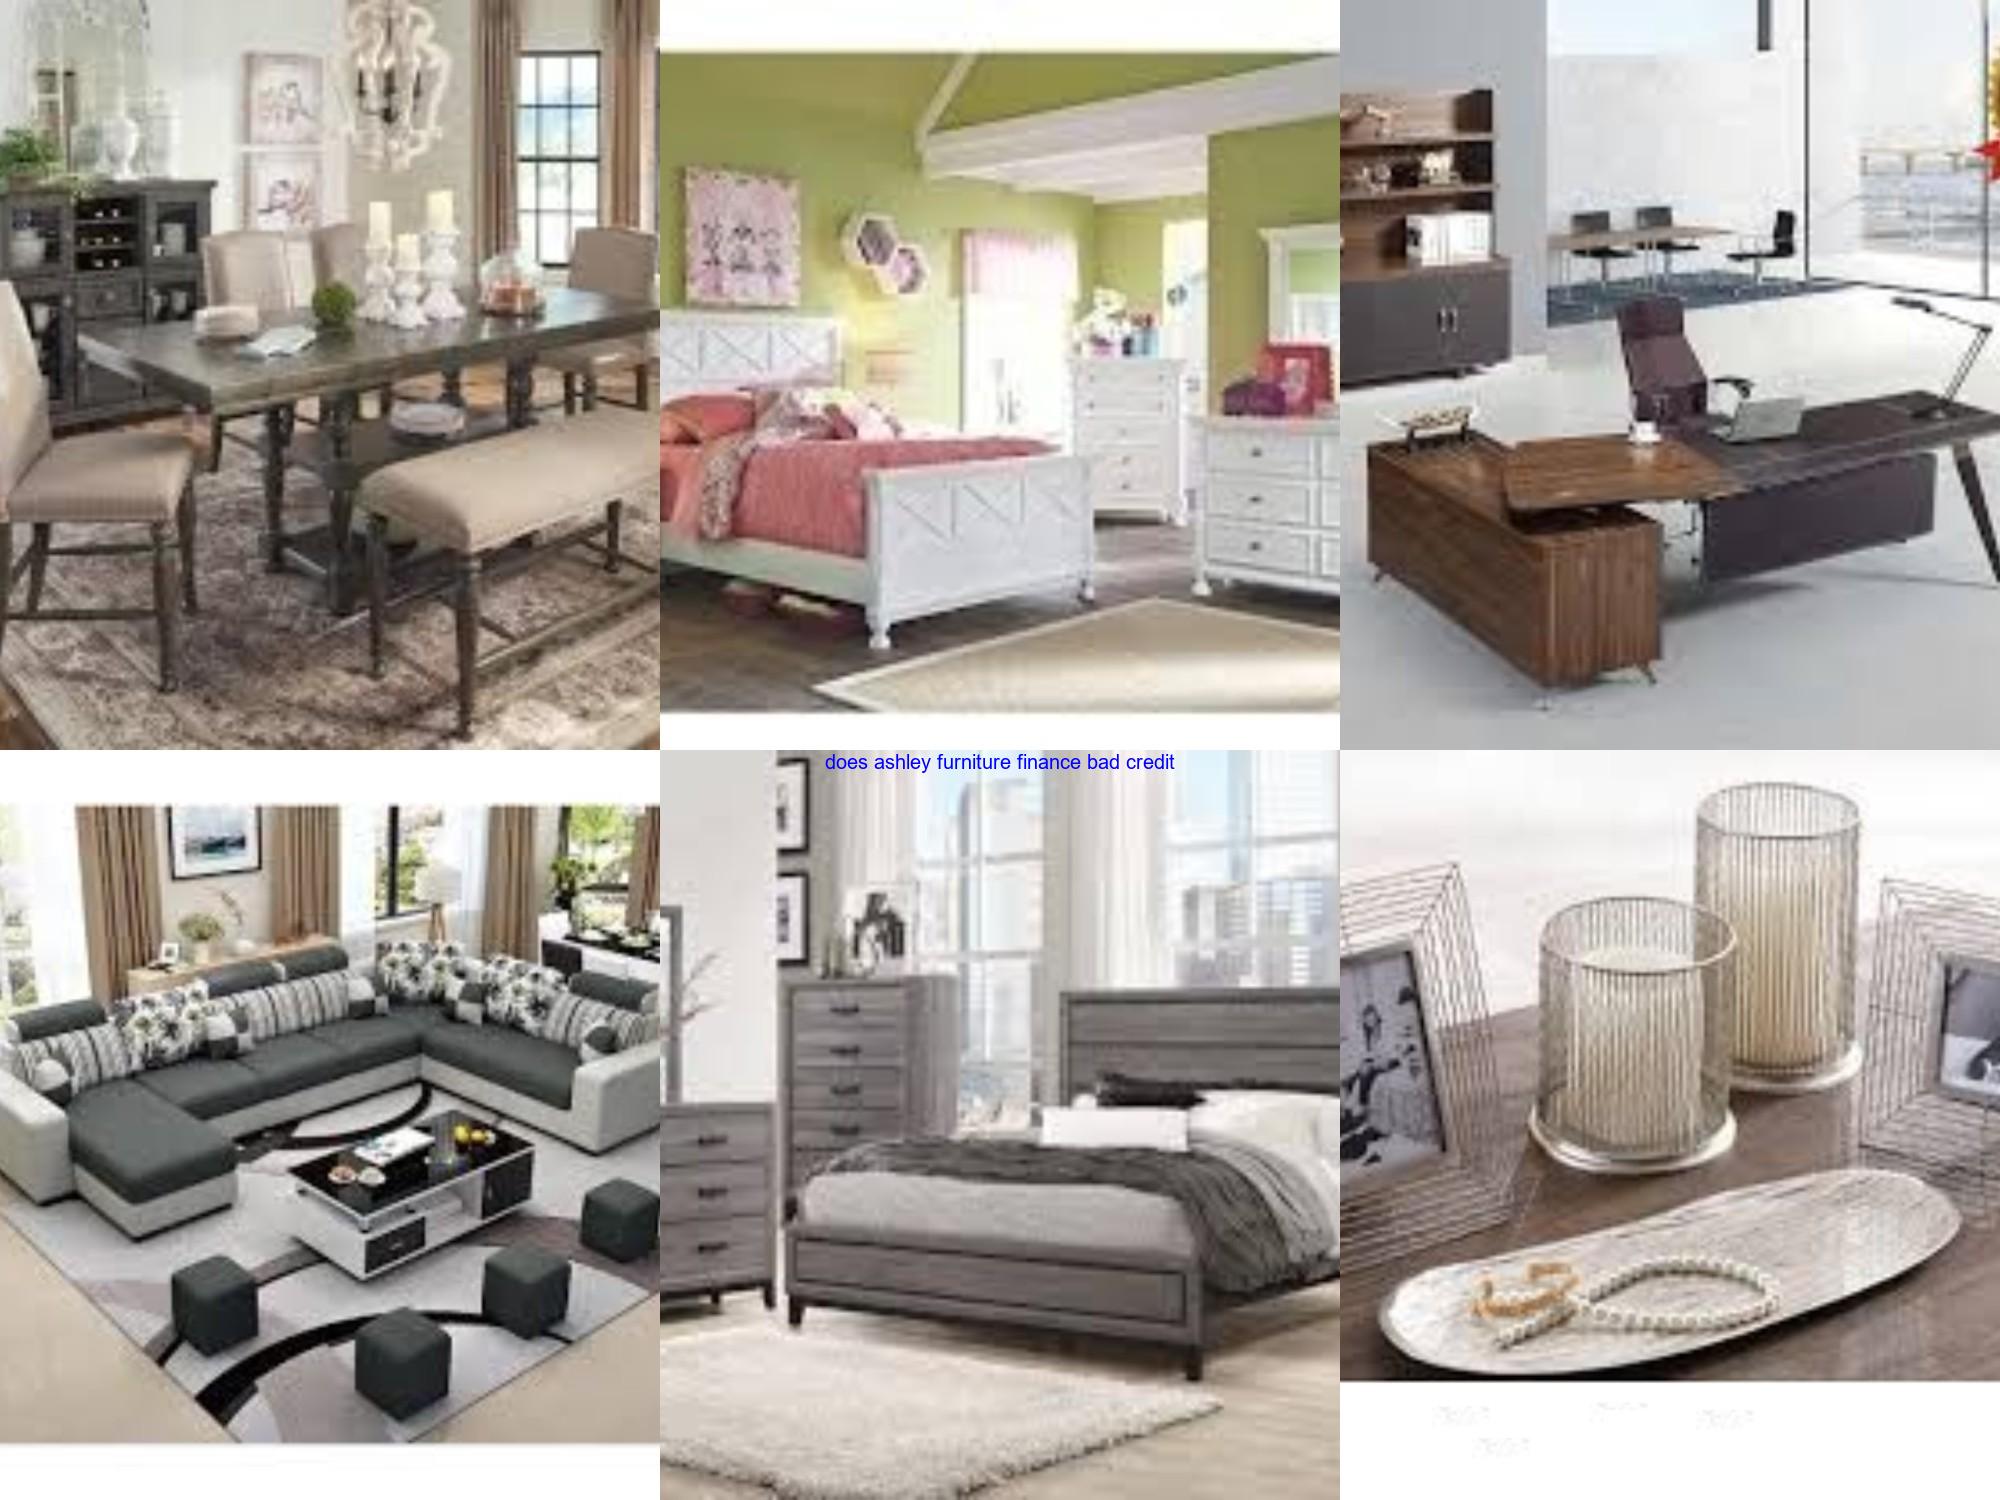 Does Ashley Furniture Finance Bad Credit Furniture Prices Wholesale Furniture Furniture